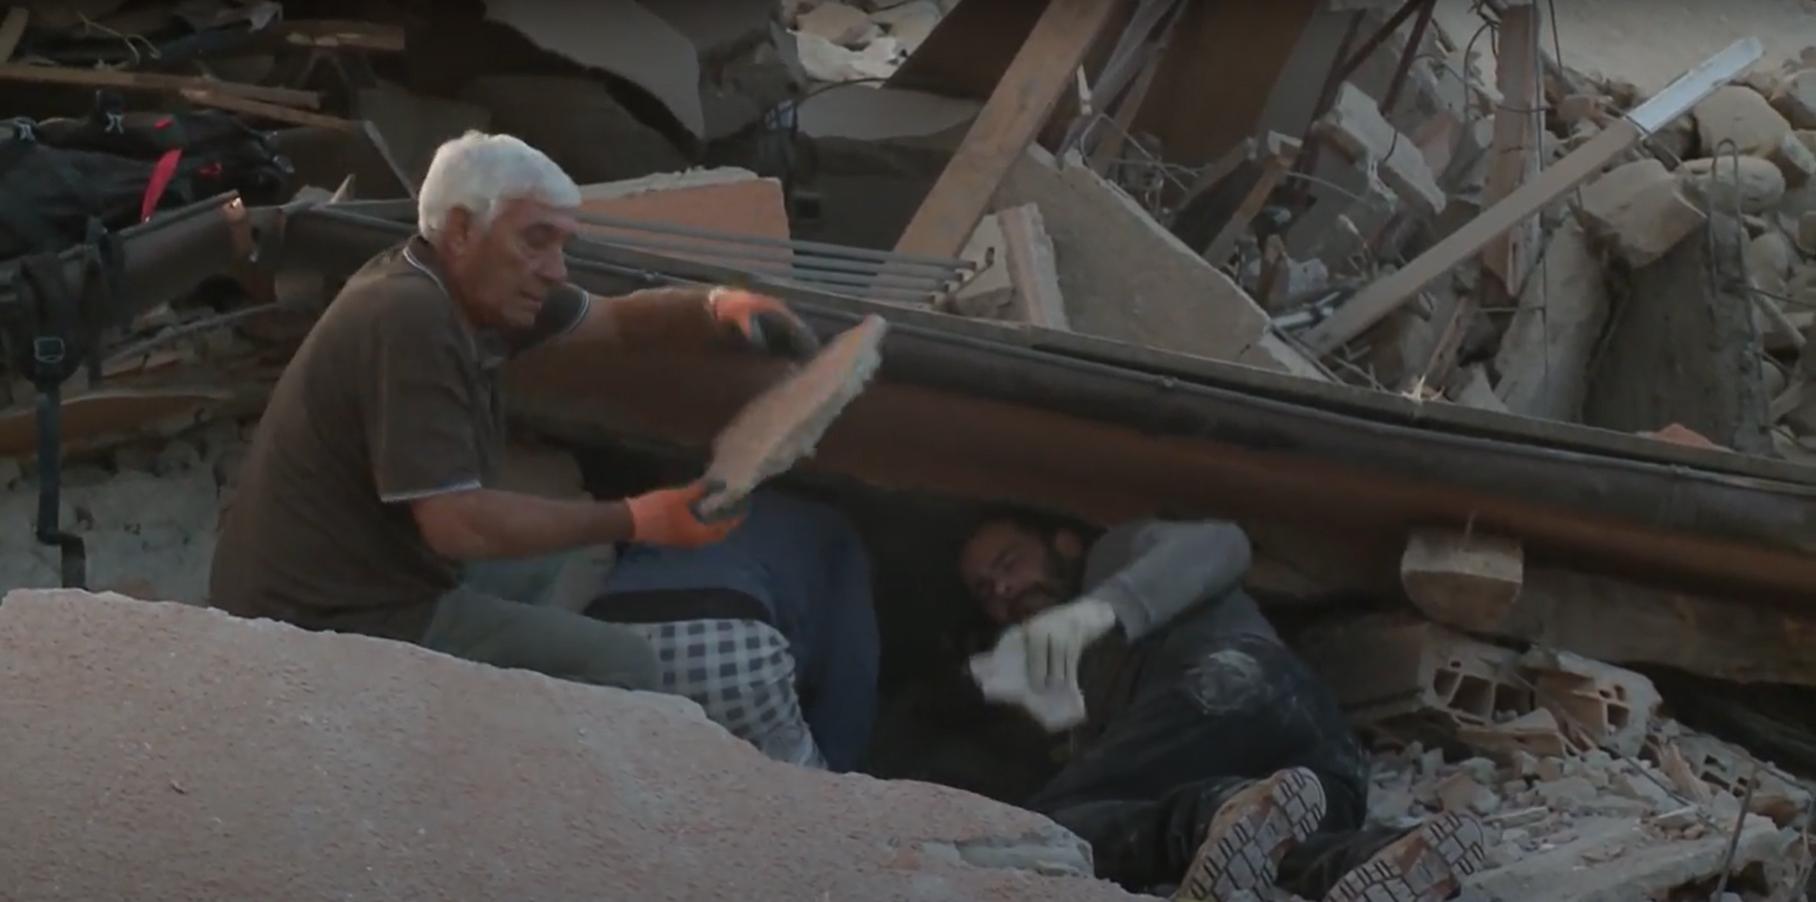 Terremoto di Amatrice, i primi soccorsi